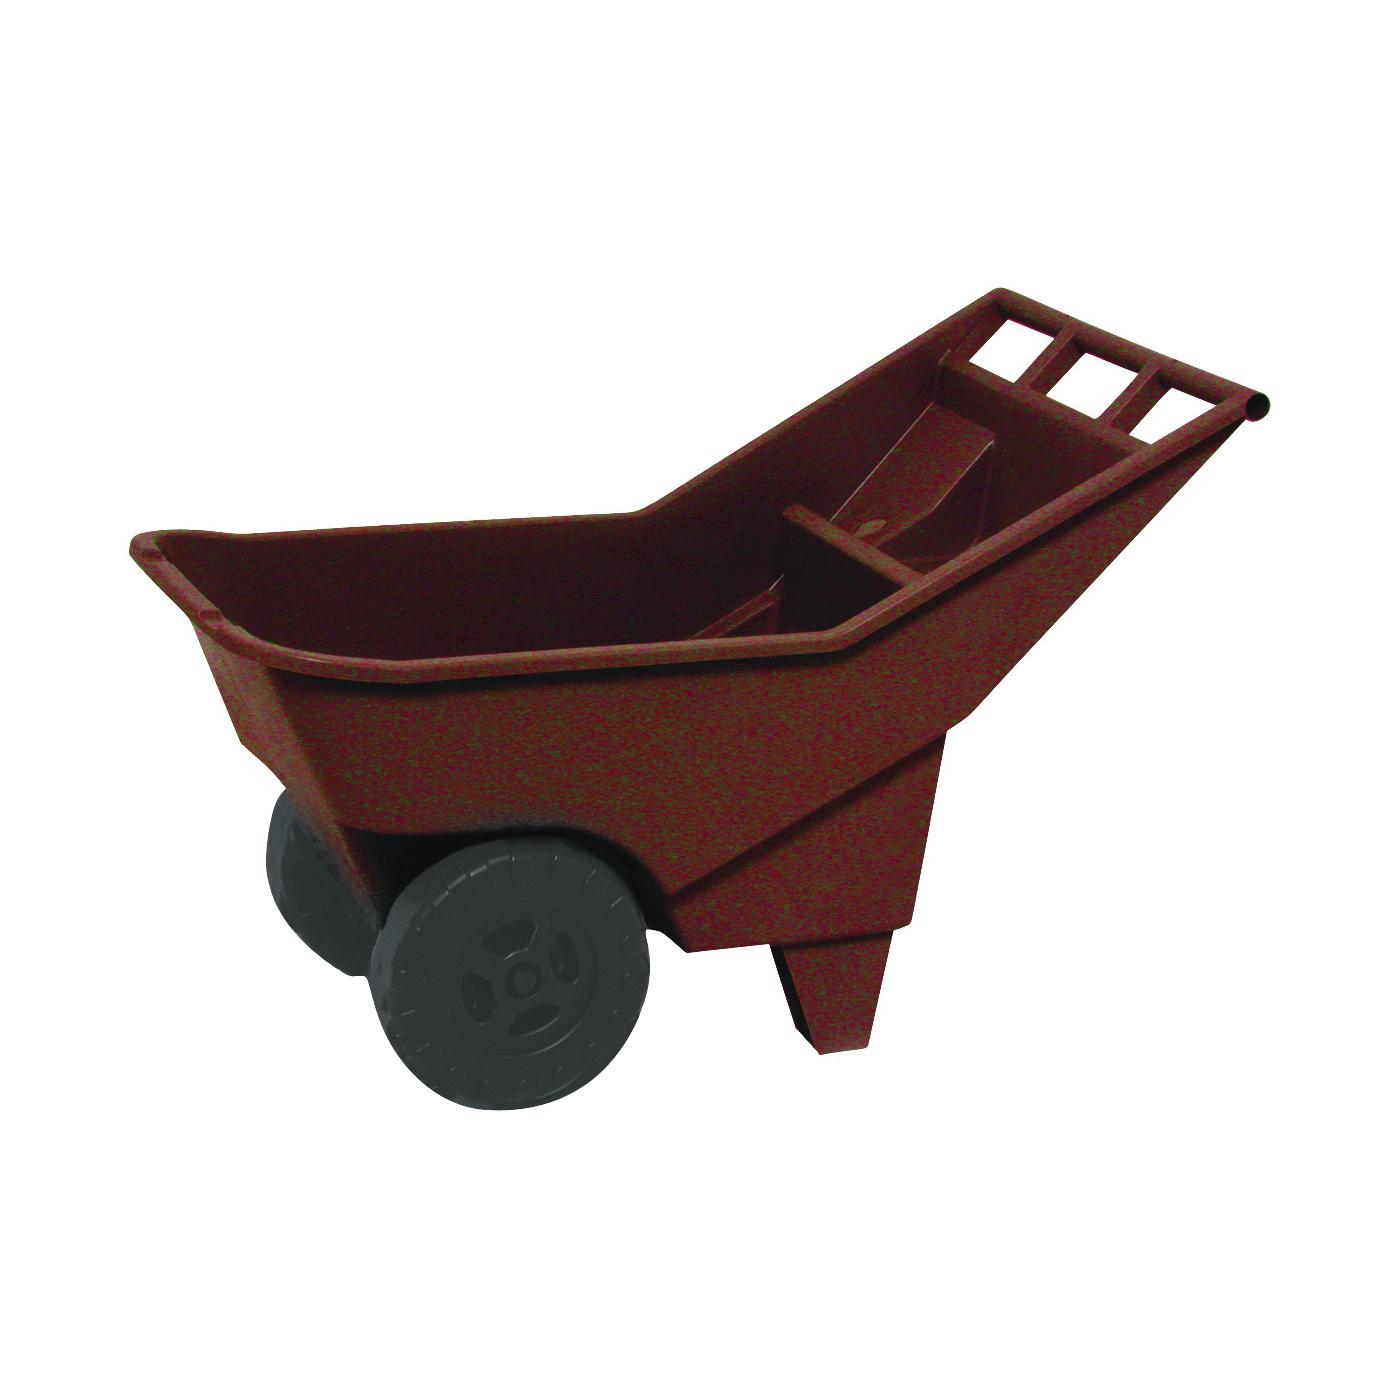 Picture of Rubbermaid 370712907 Lawn Cart, 200 lb, Polyethylene Deck, 2 -Wheel, Gray